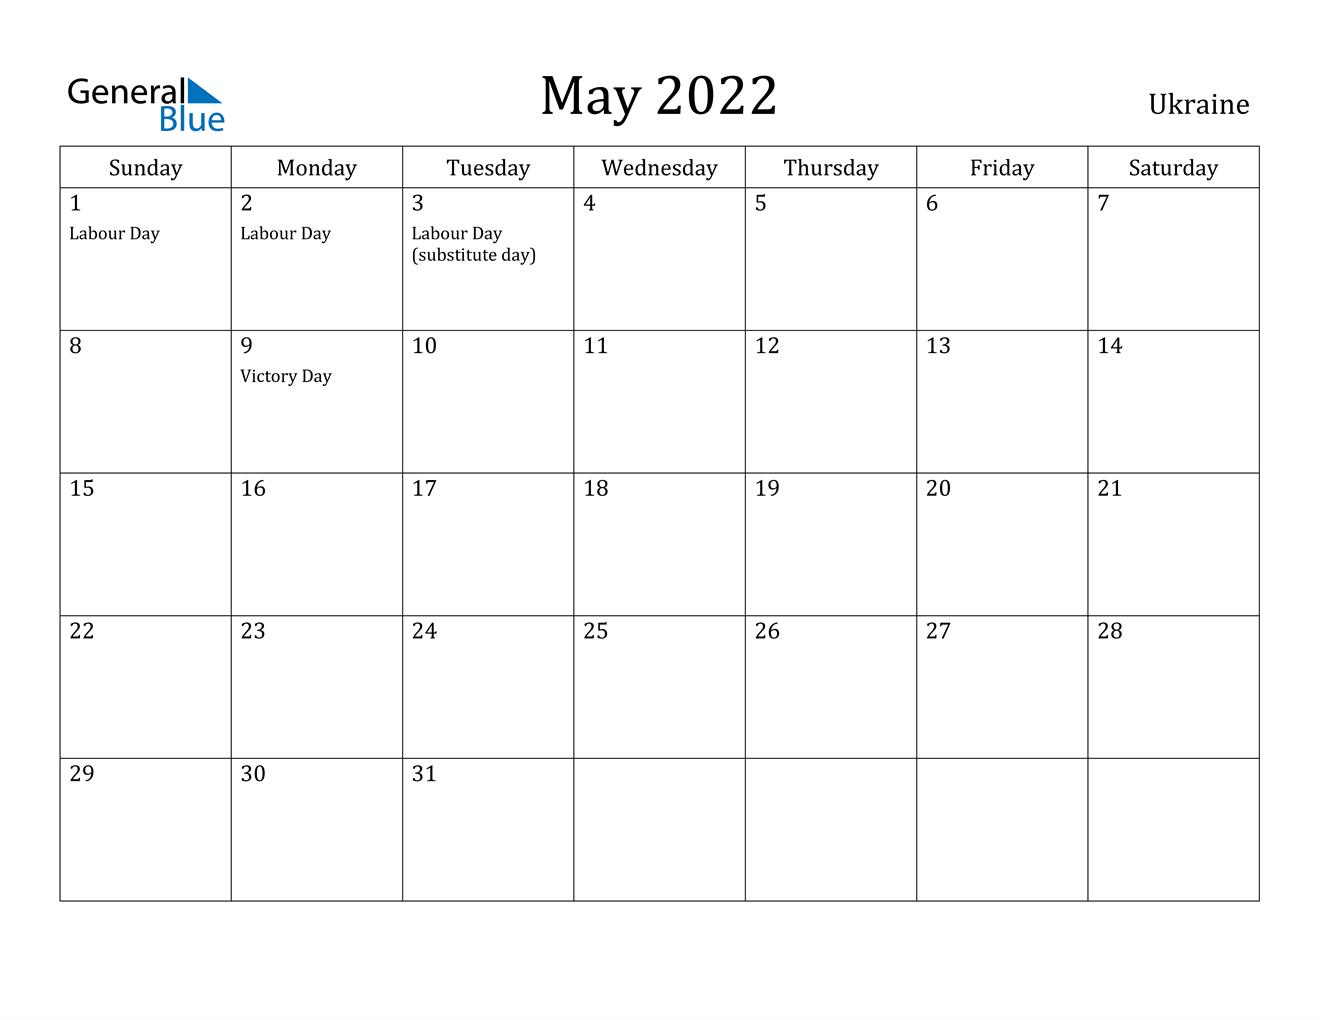 May 2022 Calendar - Ukraine